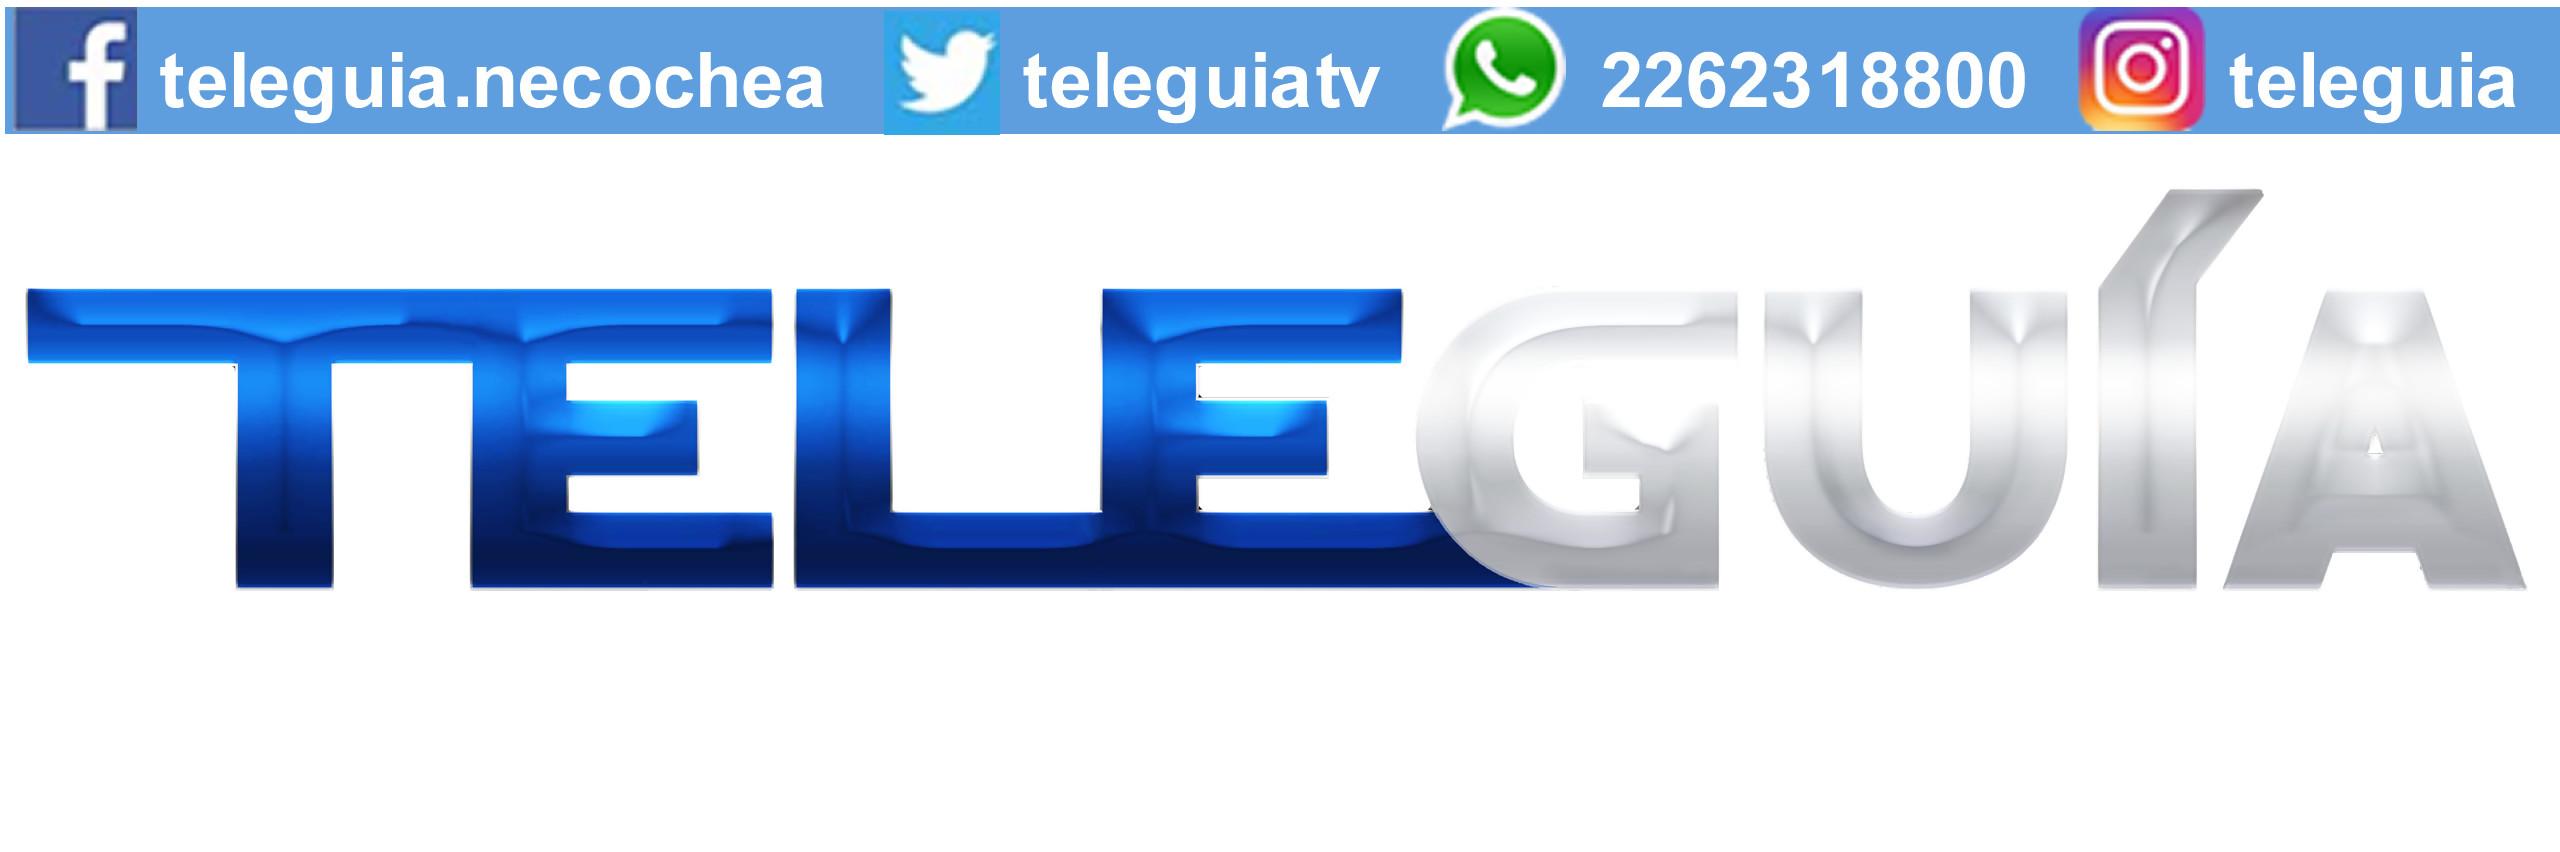 teleguiatv